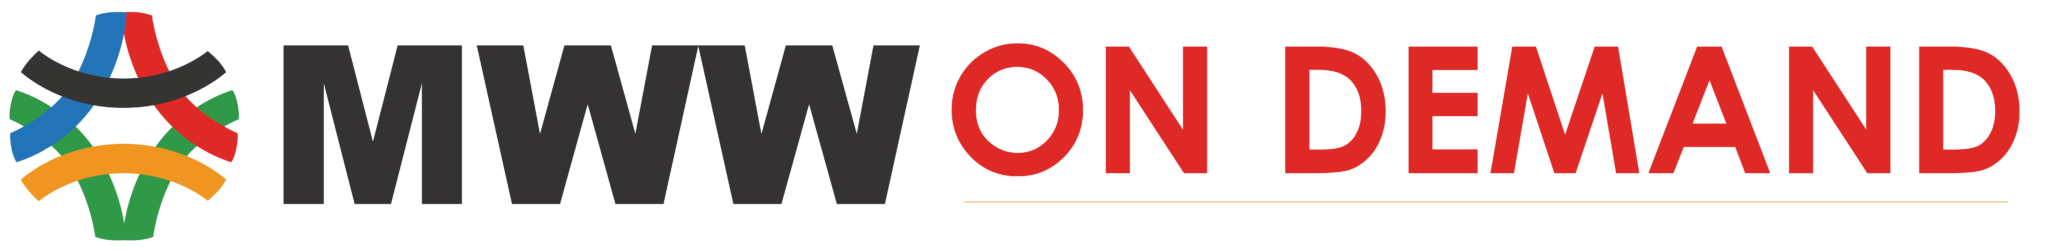 MWW On Demand logo